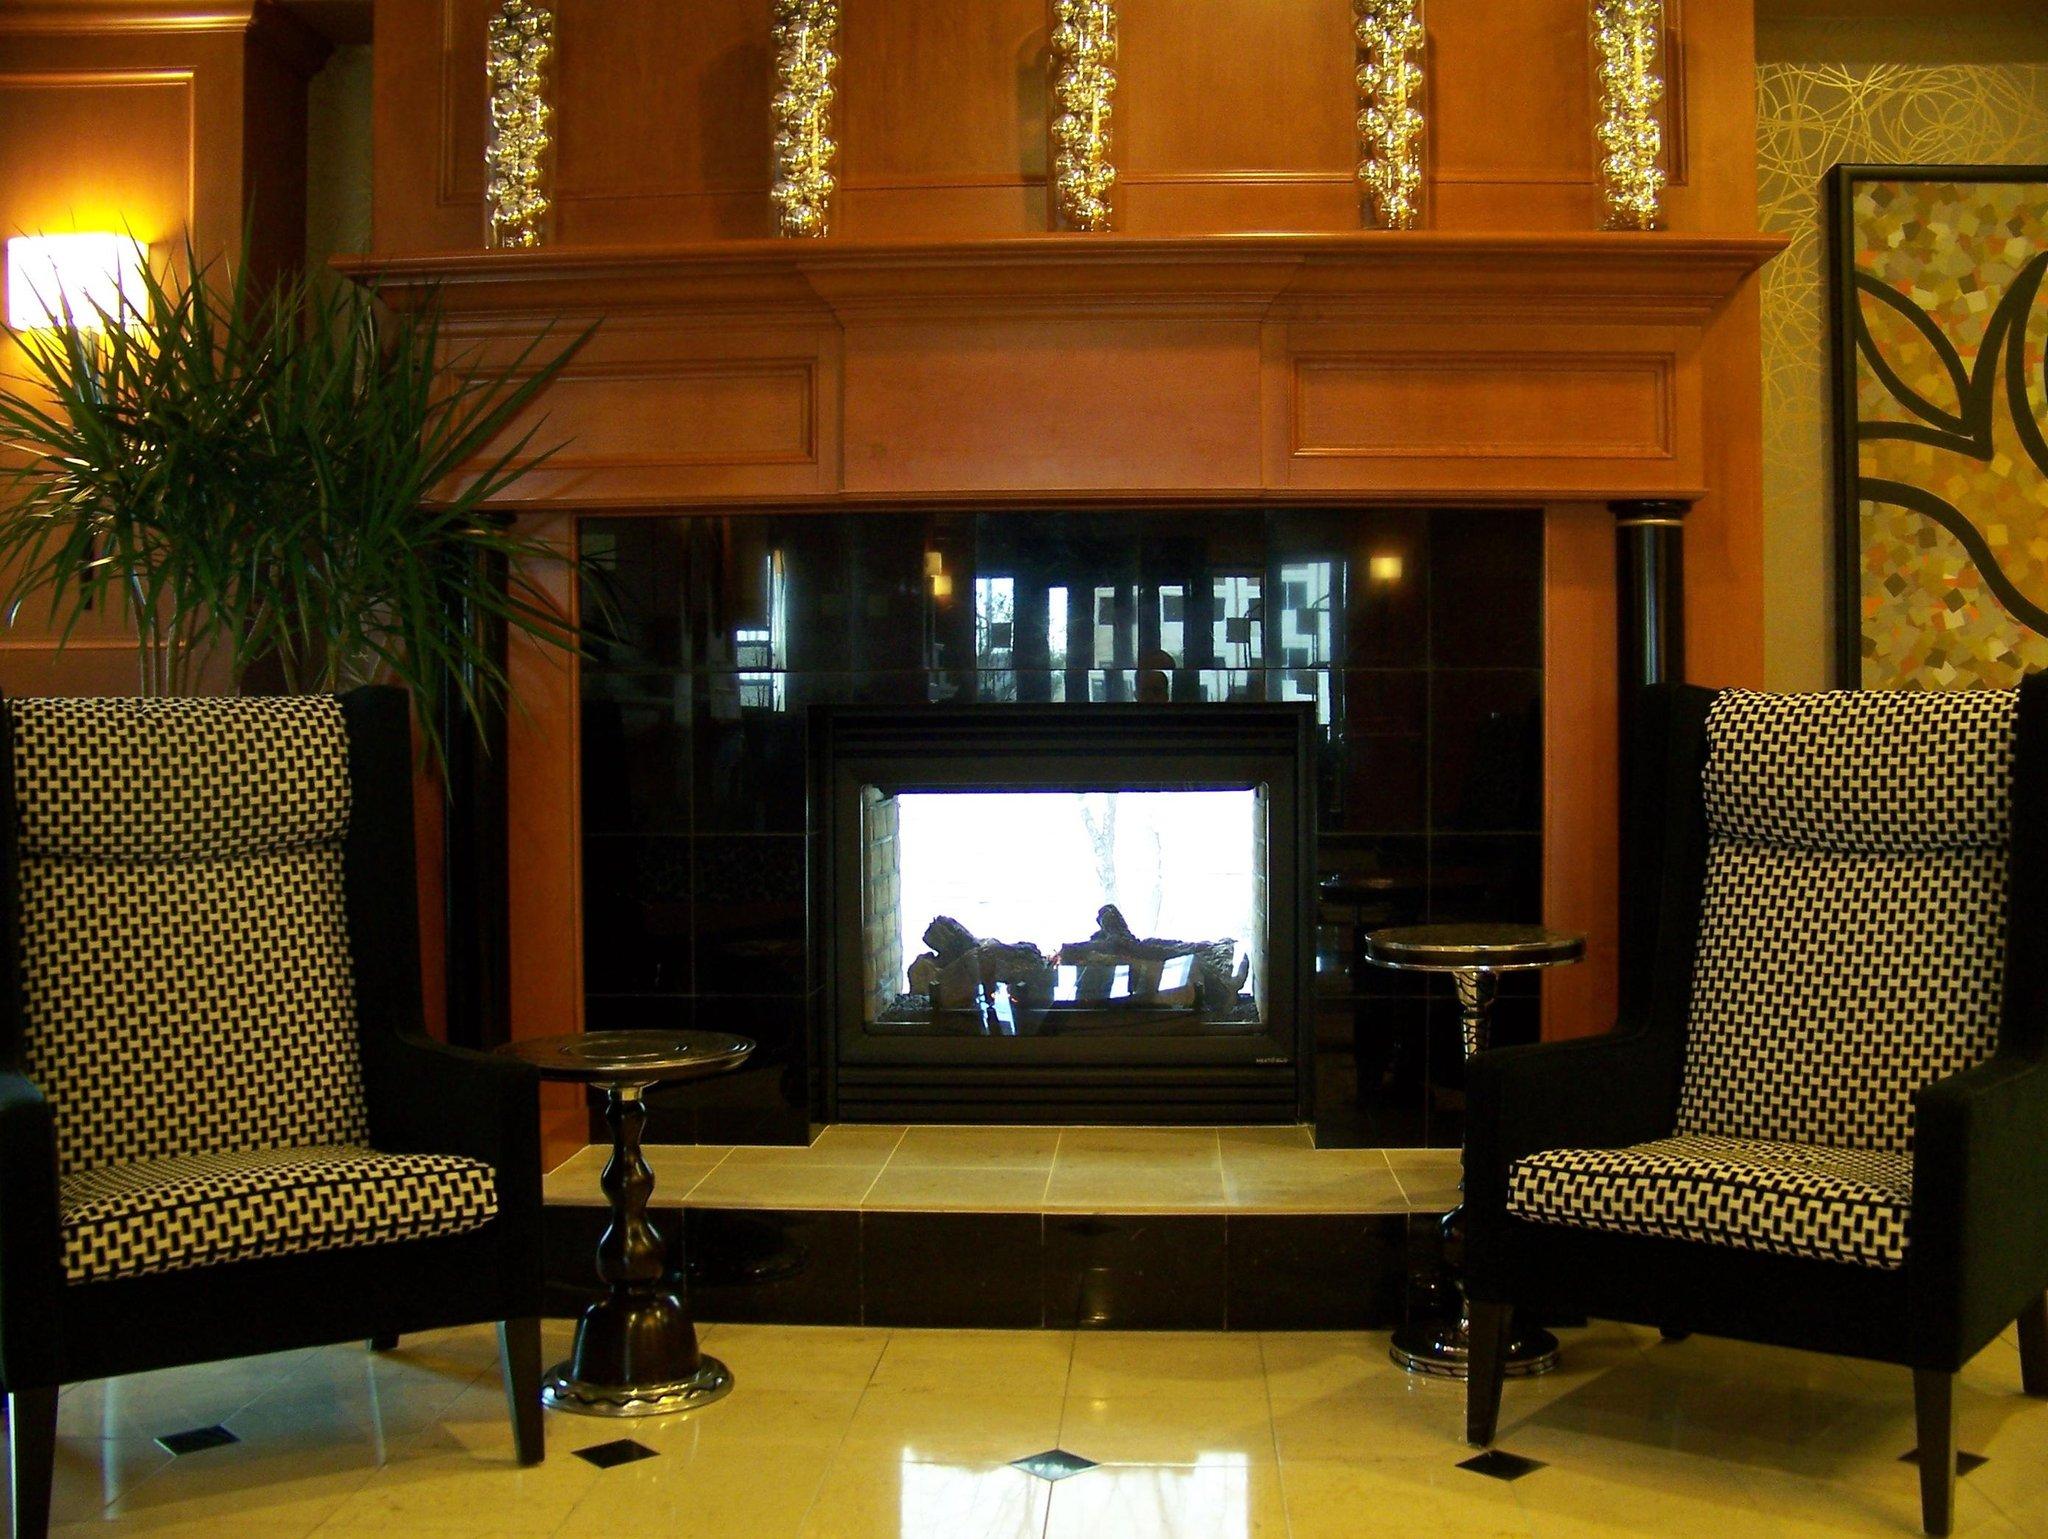 Meetings & Events at Hilton Garden Inn Las Colinas Irving TX US